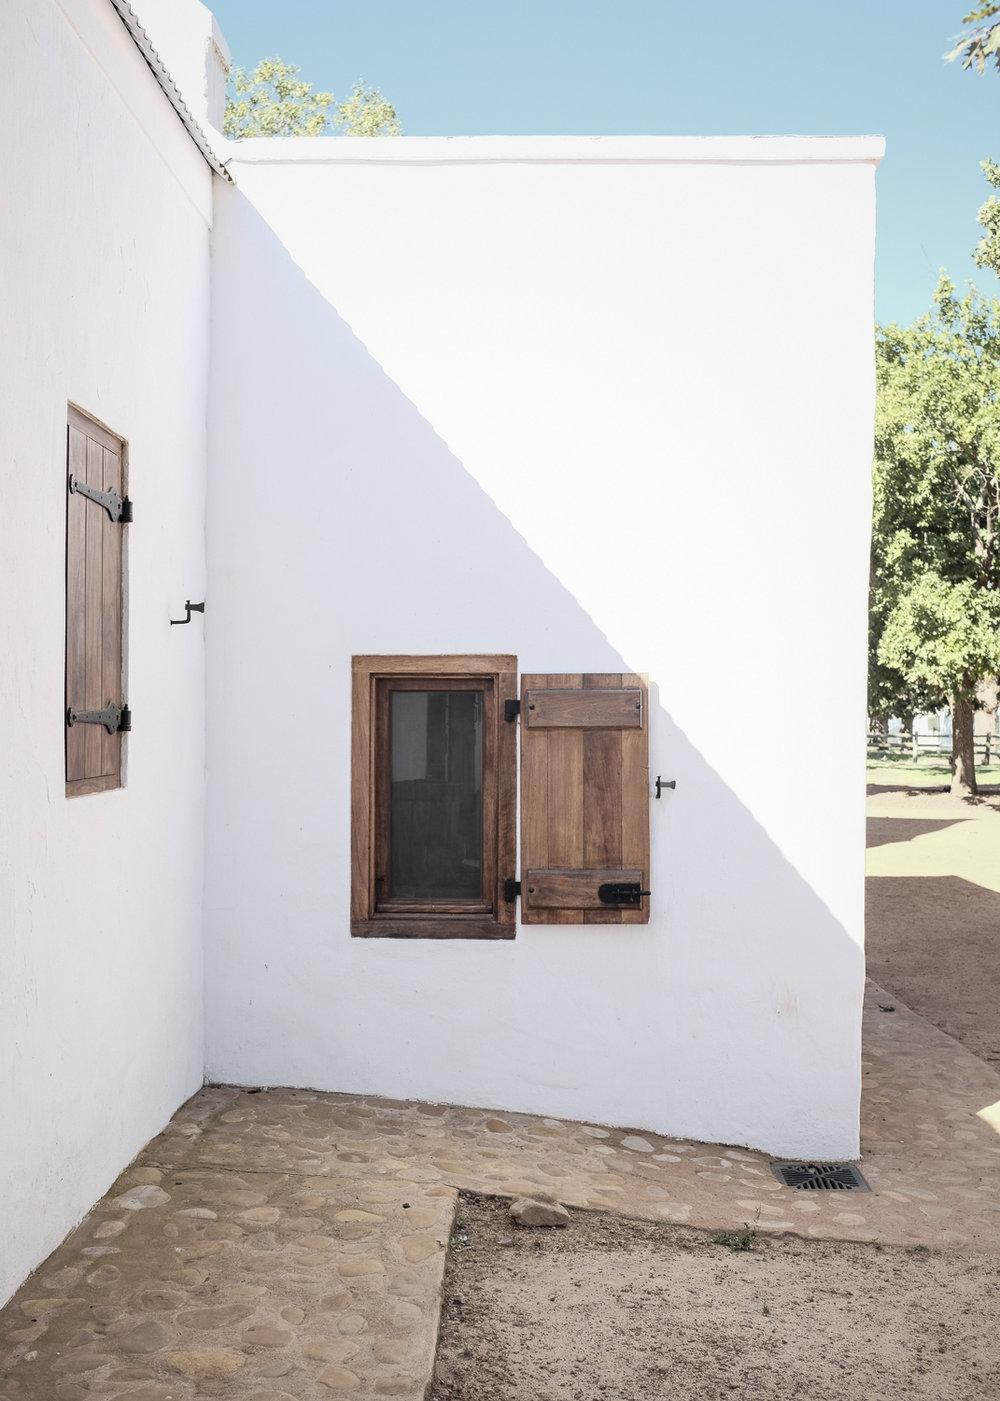 cape-town-south-africa-paarl-babylonstoren-wine-estate-26.jpg